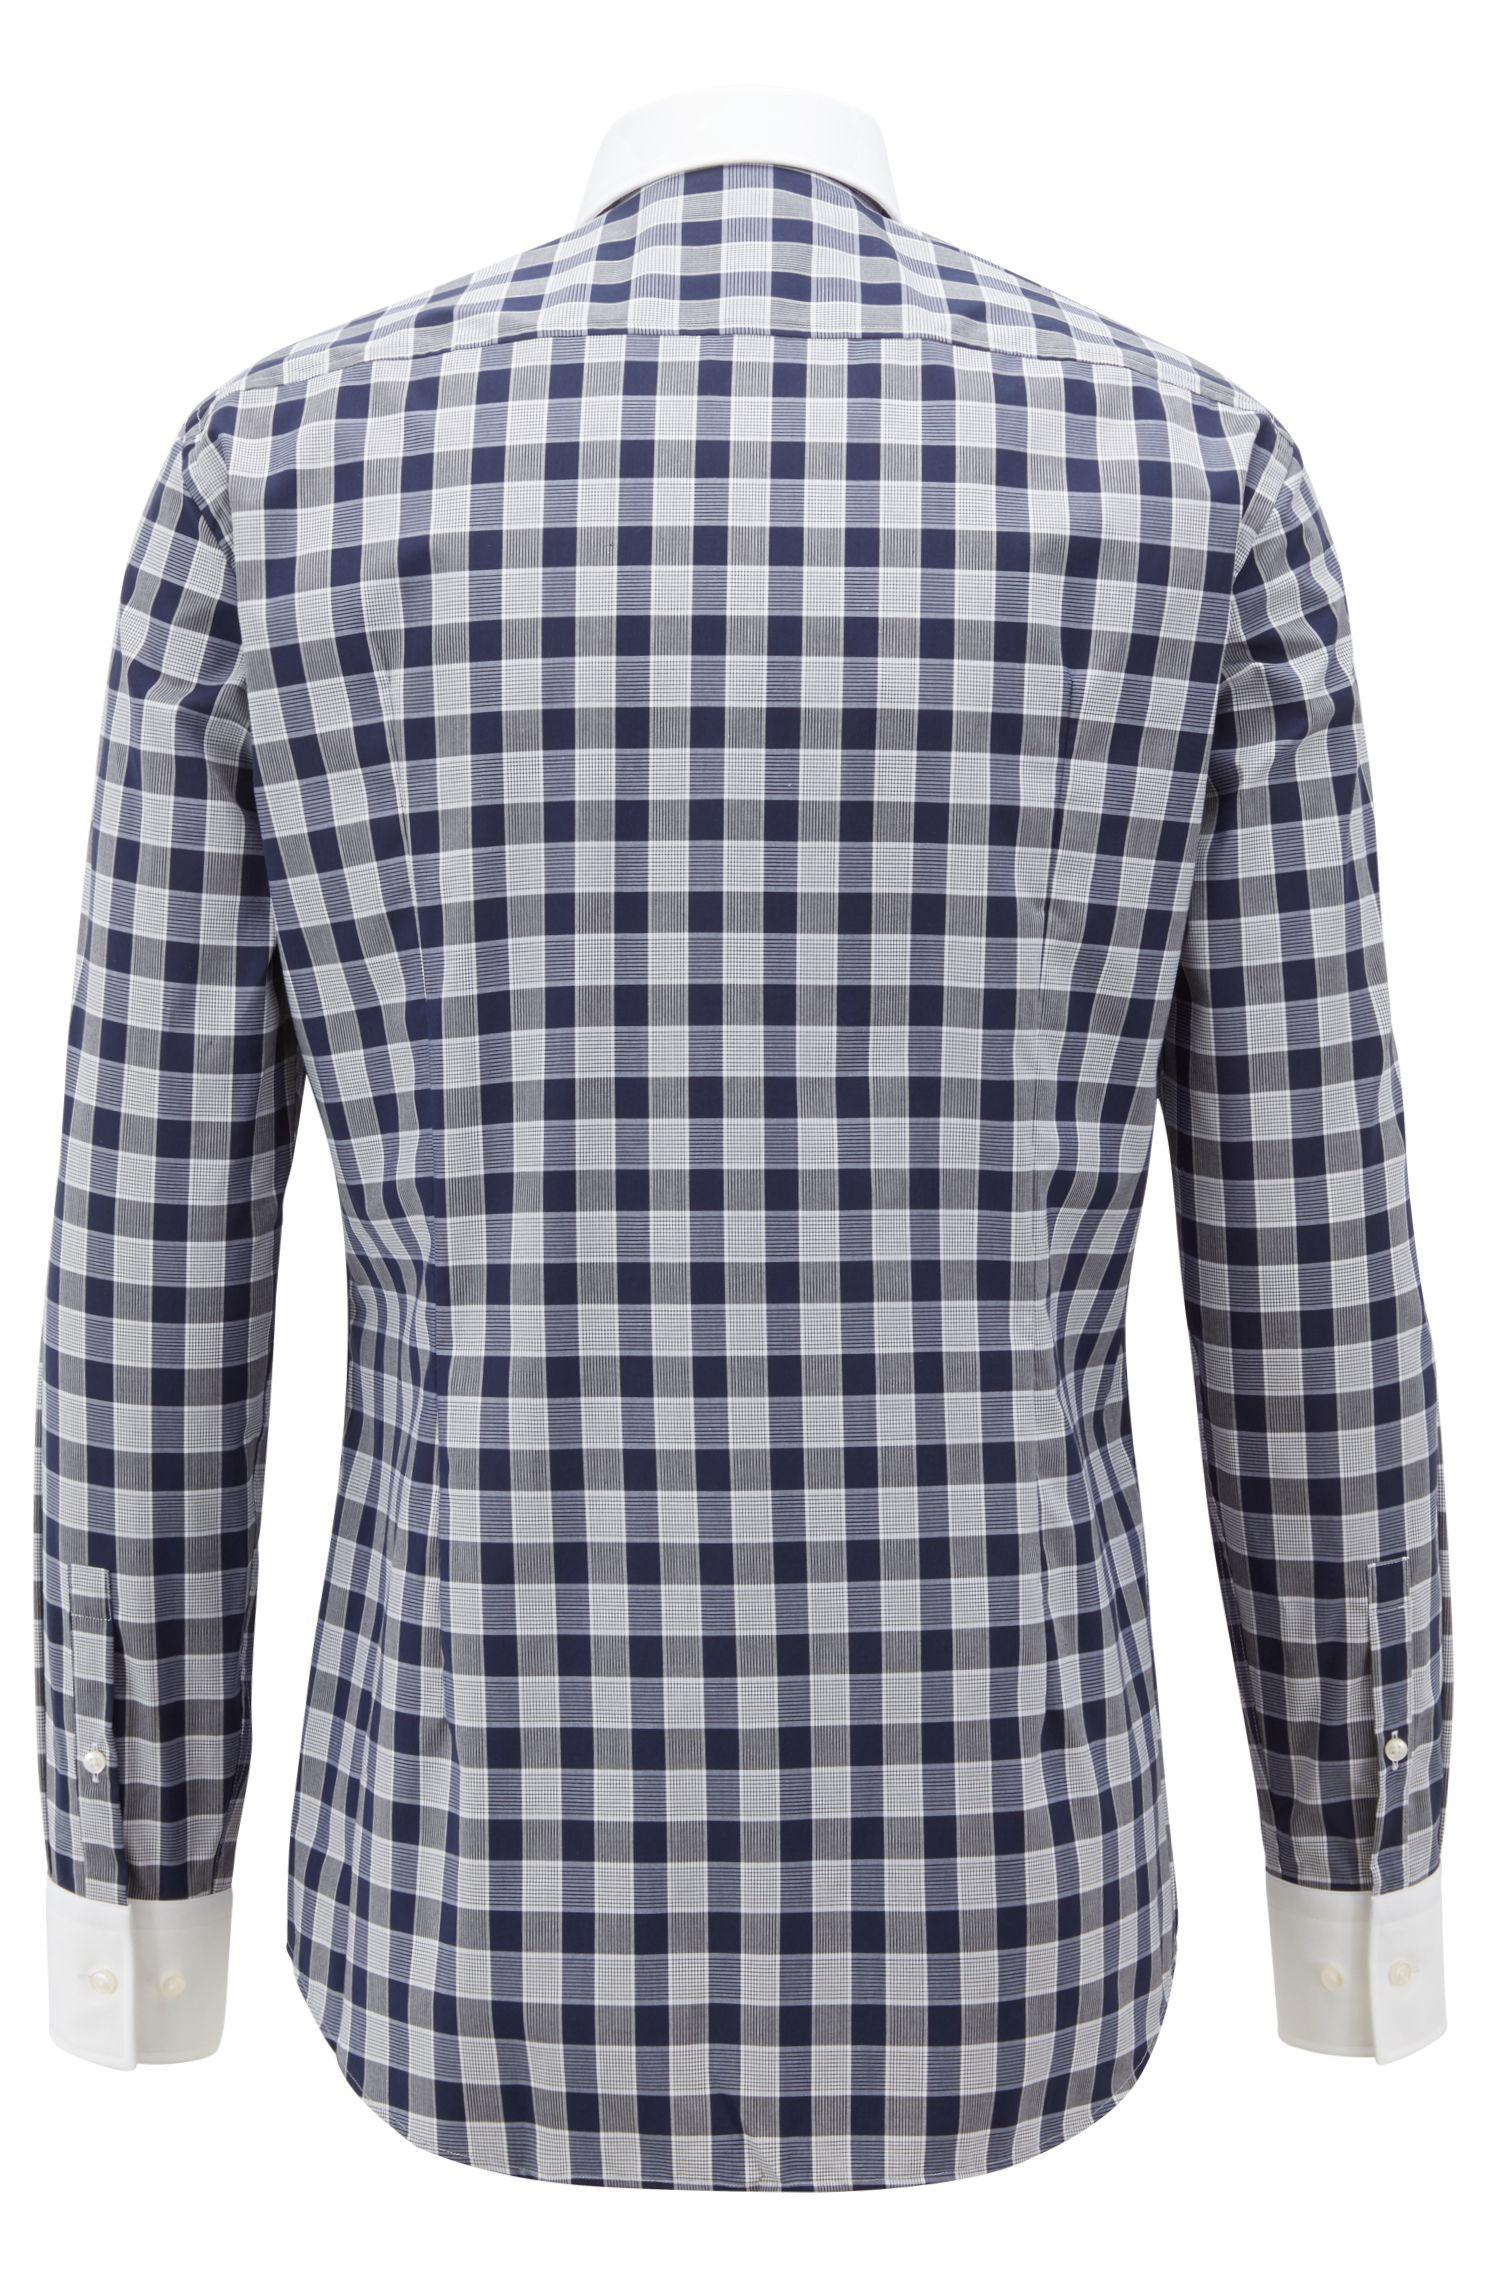 Slim-fit shirt in Vichy check cotton poplin, Dark Blue